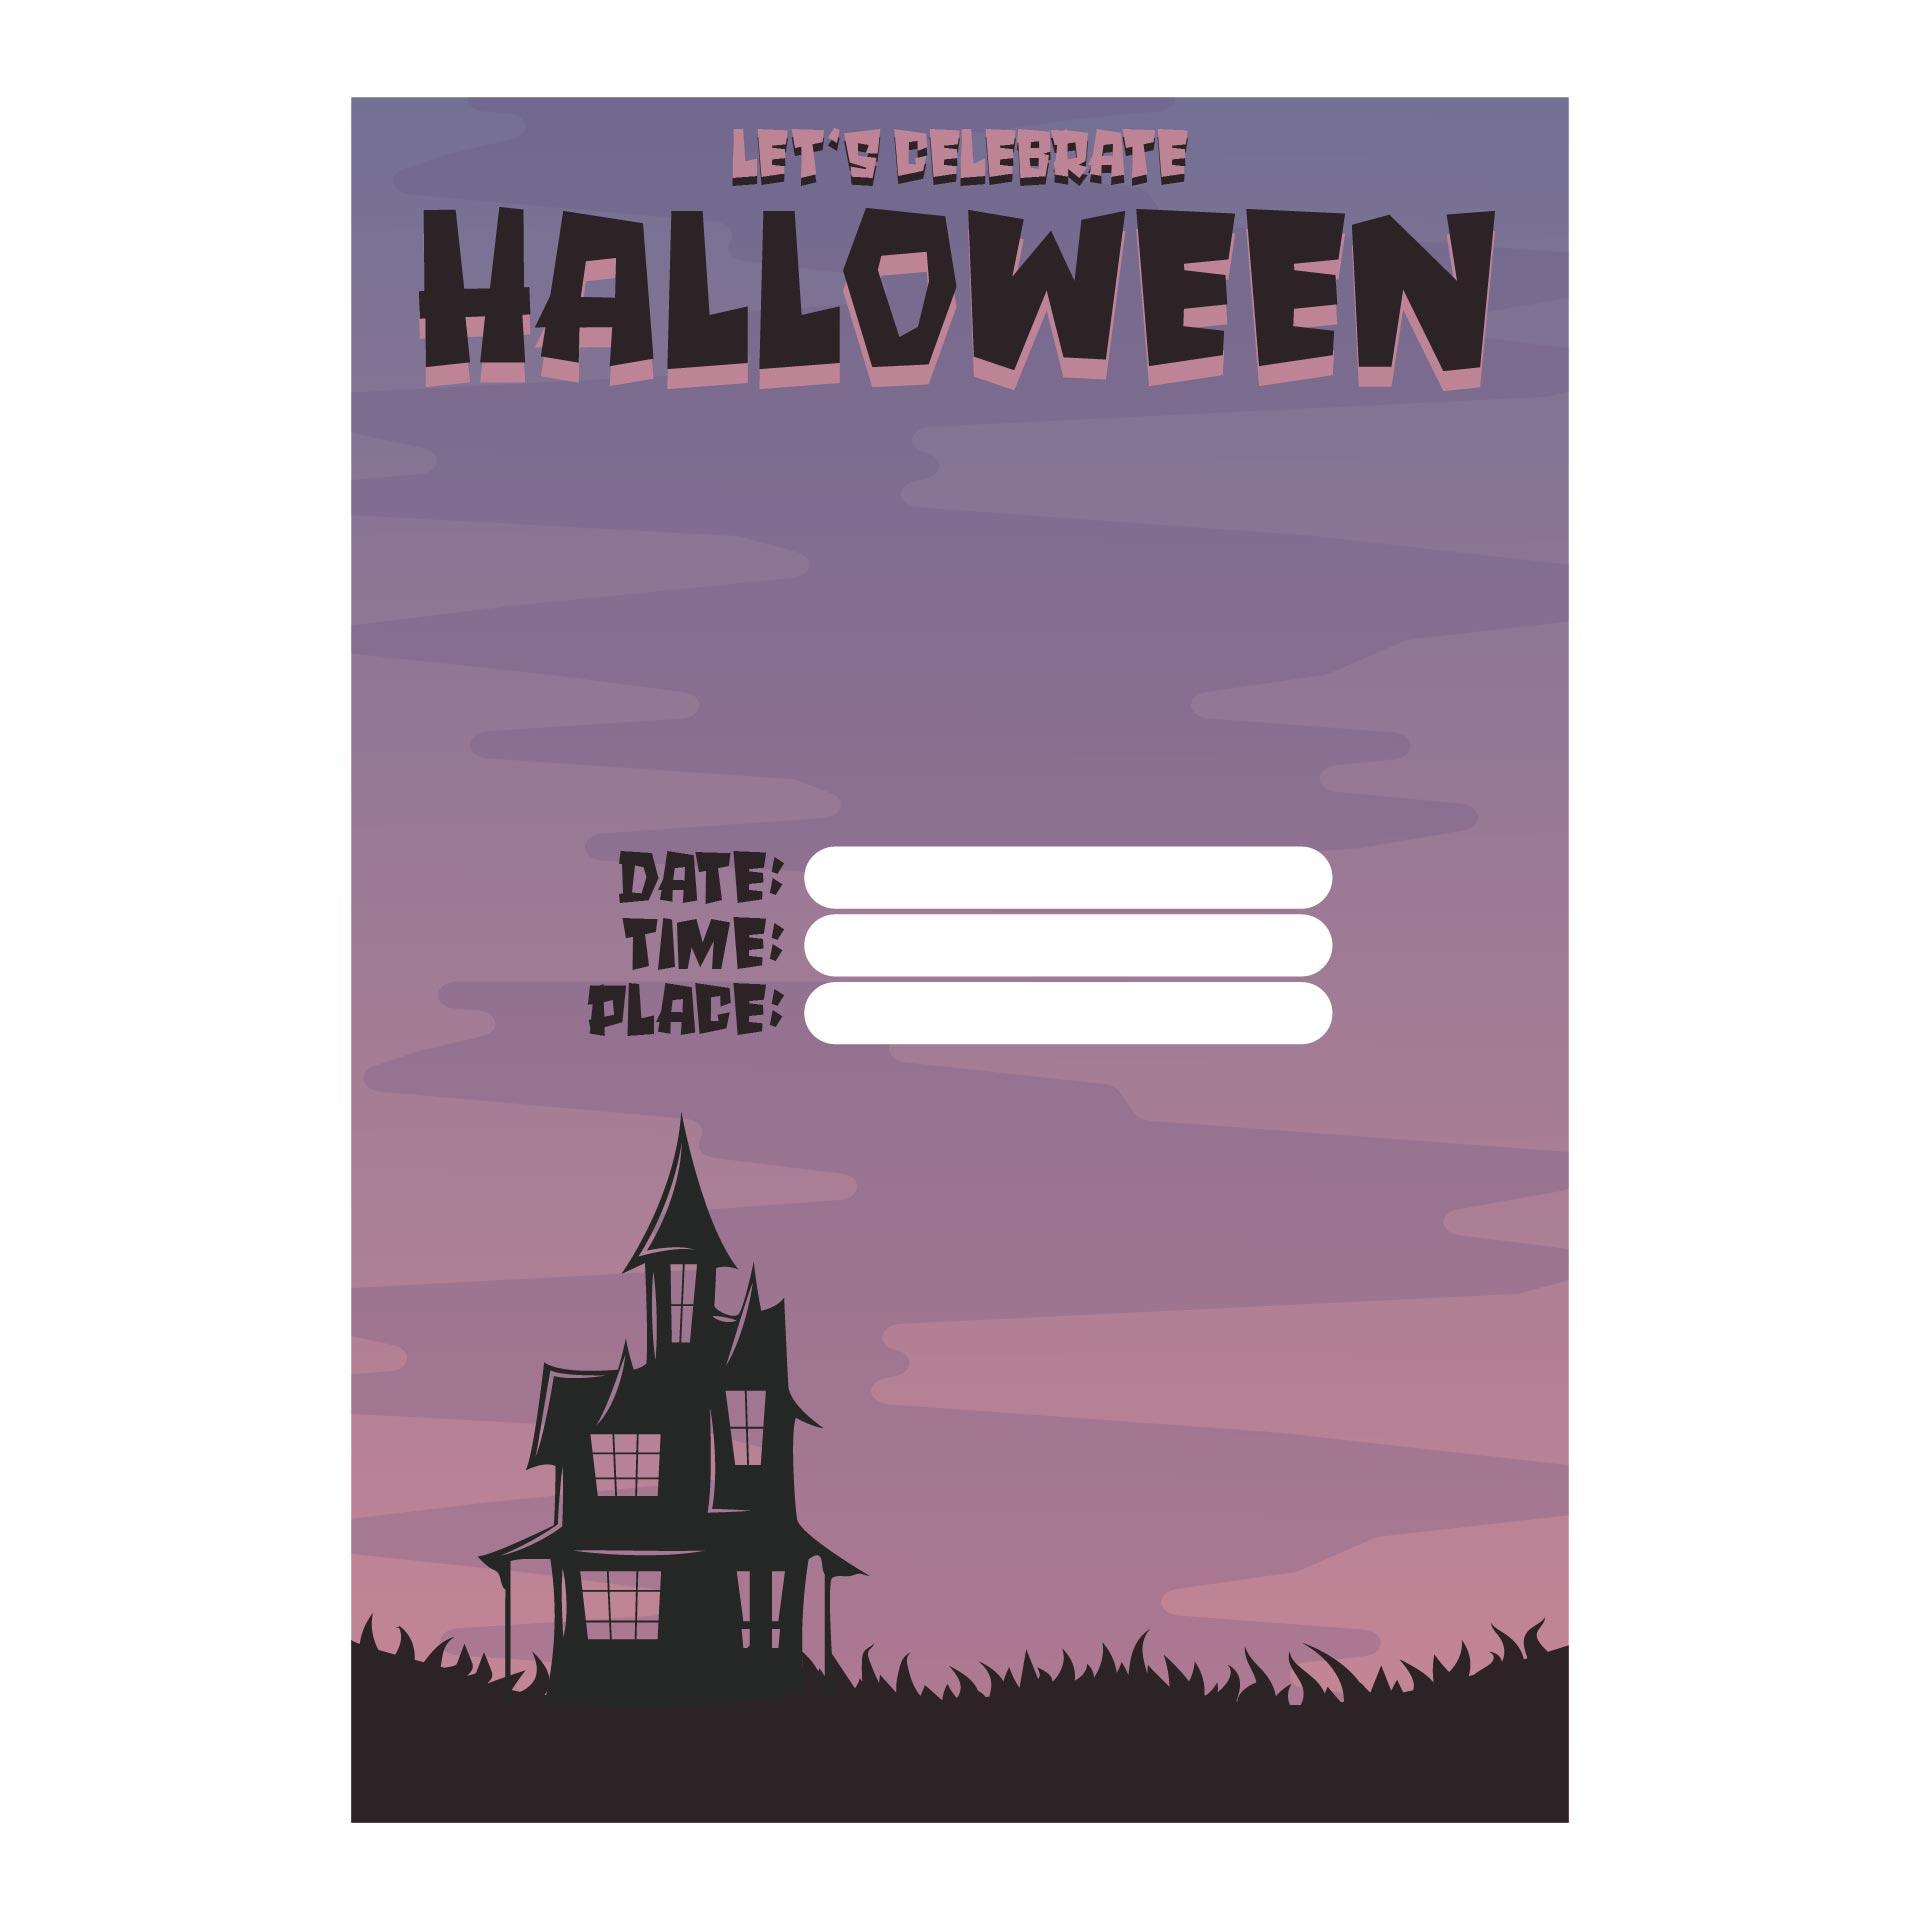 Halloween Printable Party Invitations